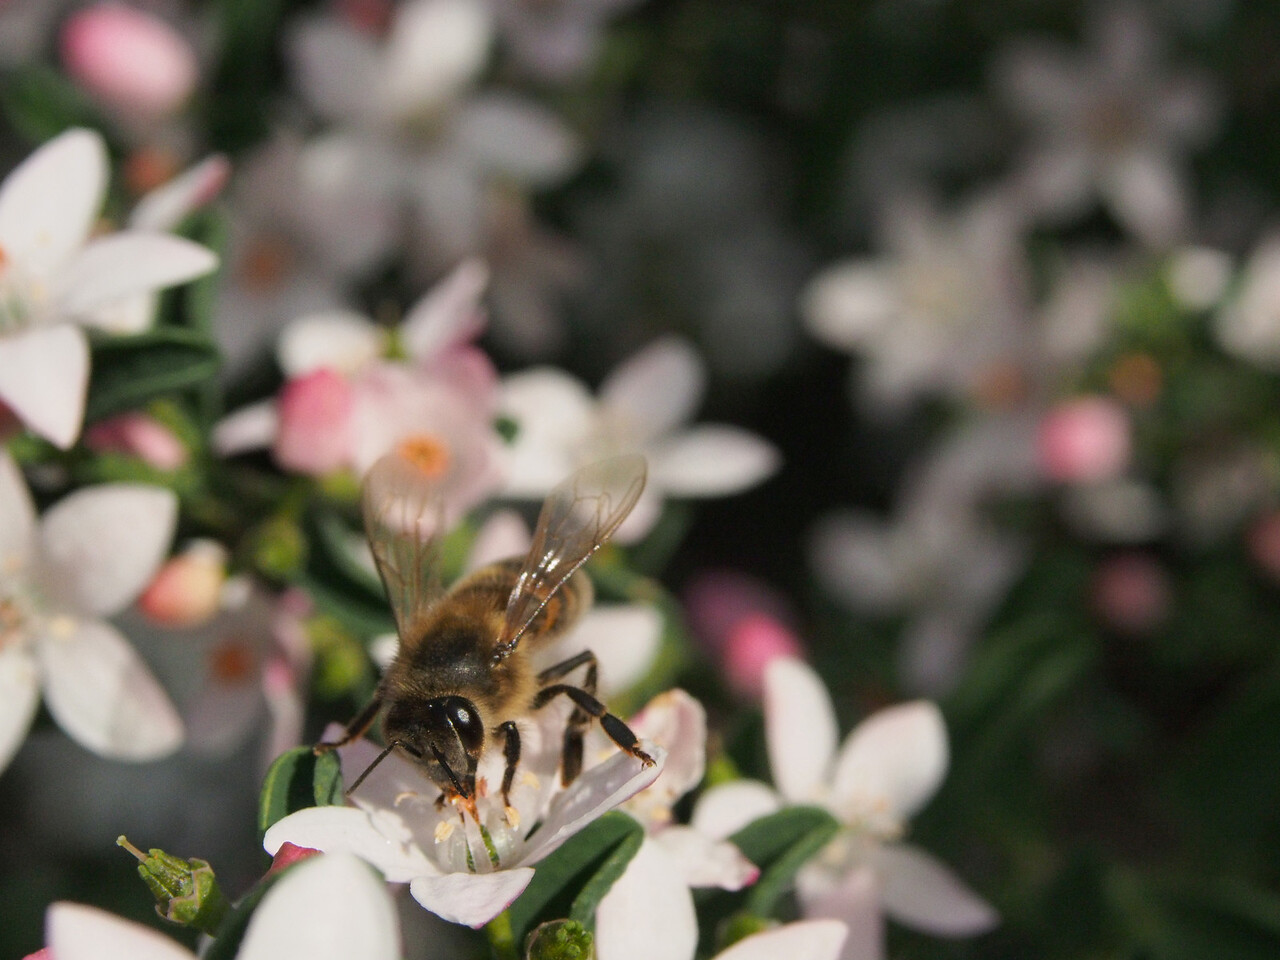 20130901_1226_1815 Kew Baptist bee